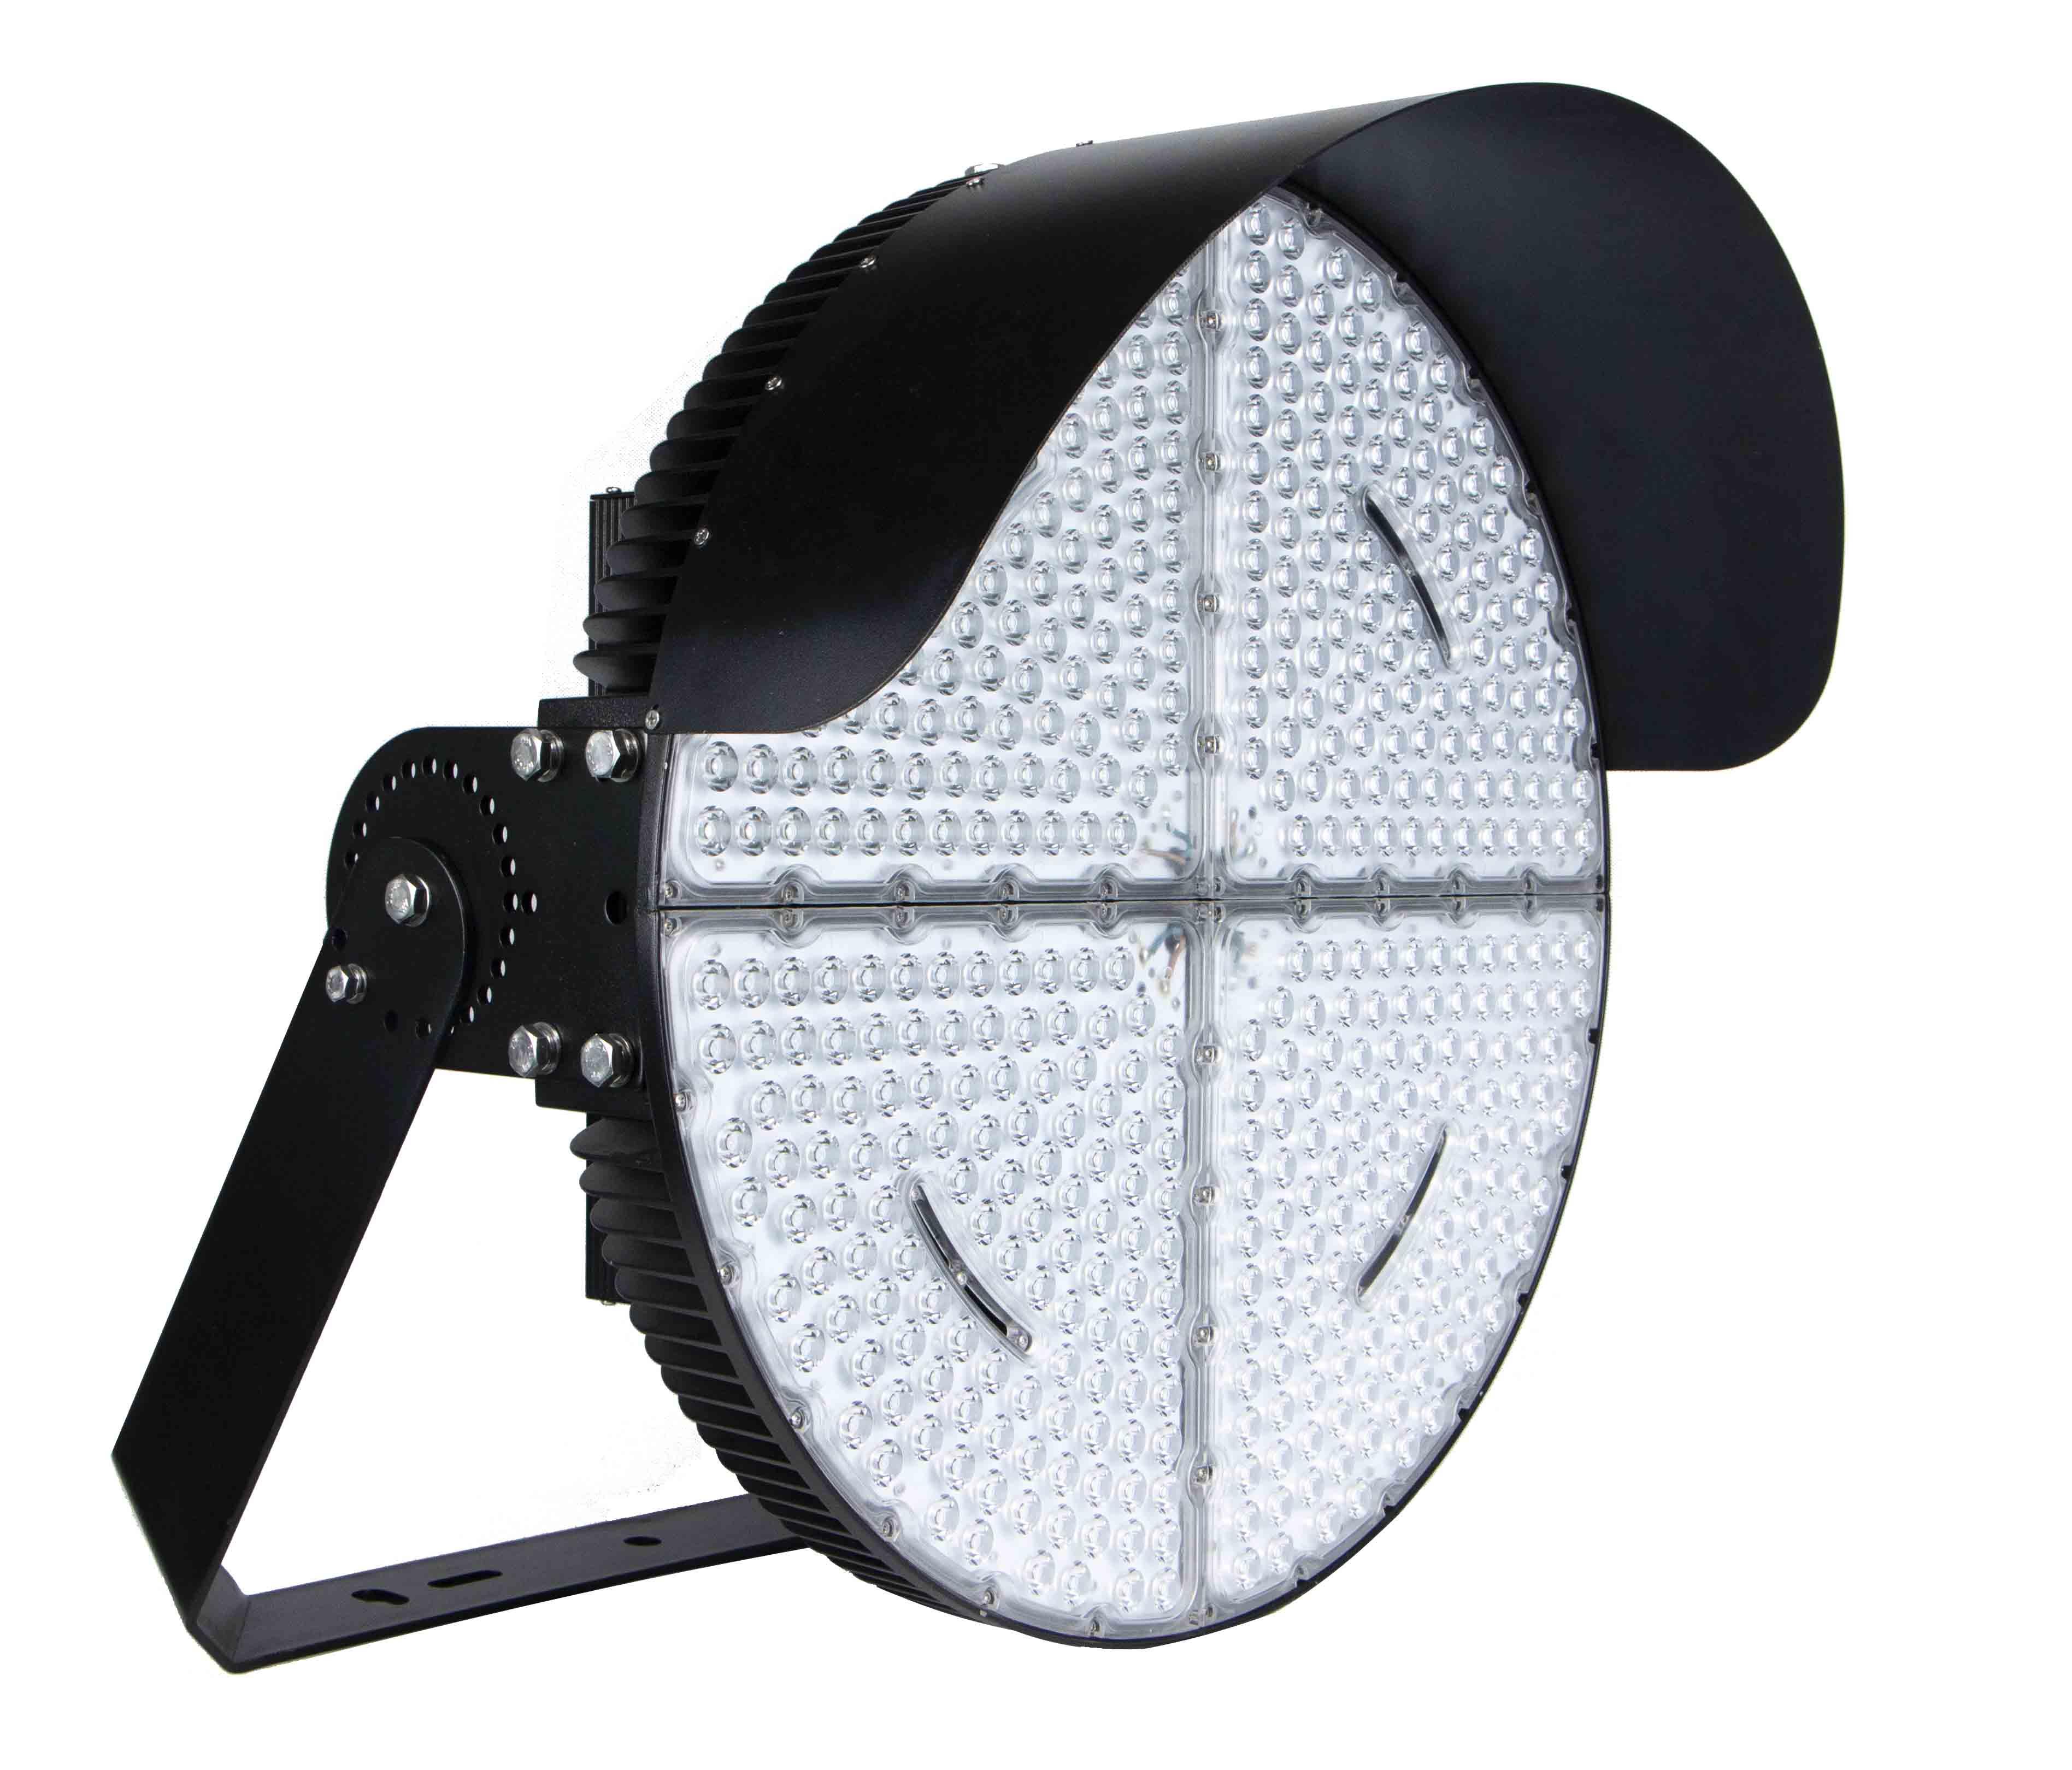 LBD-SP02-1200 1200W IP66 LED Sportstadion Licht